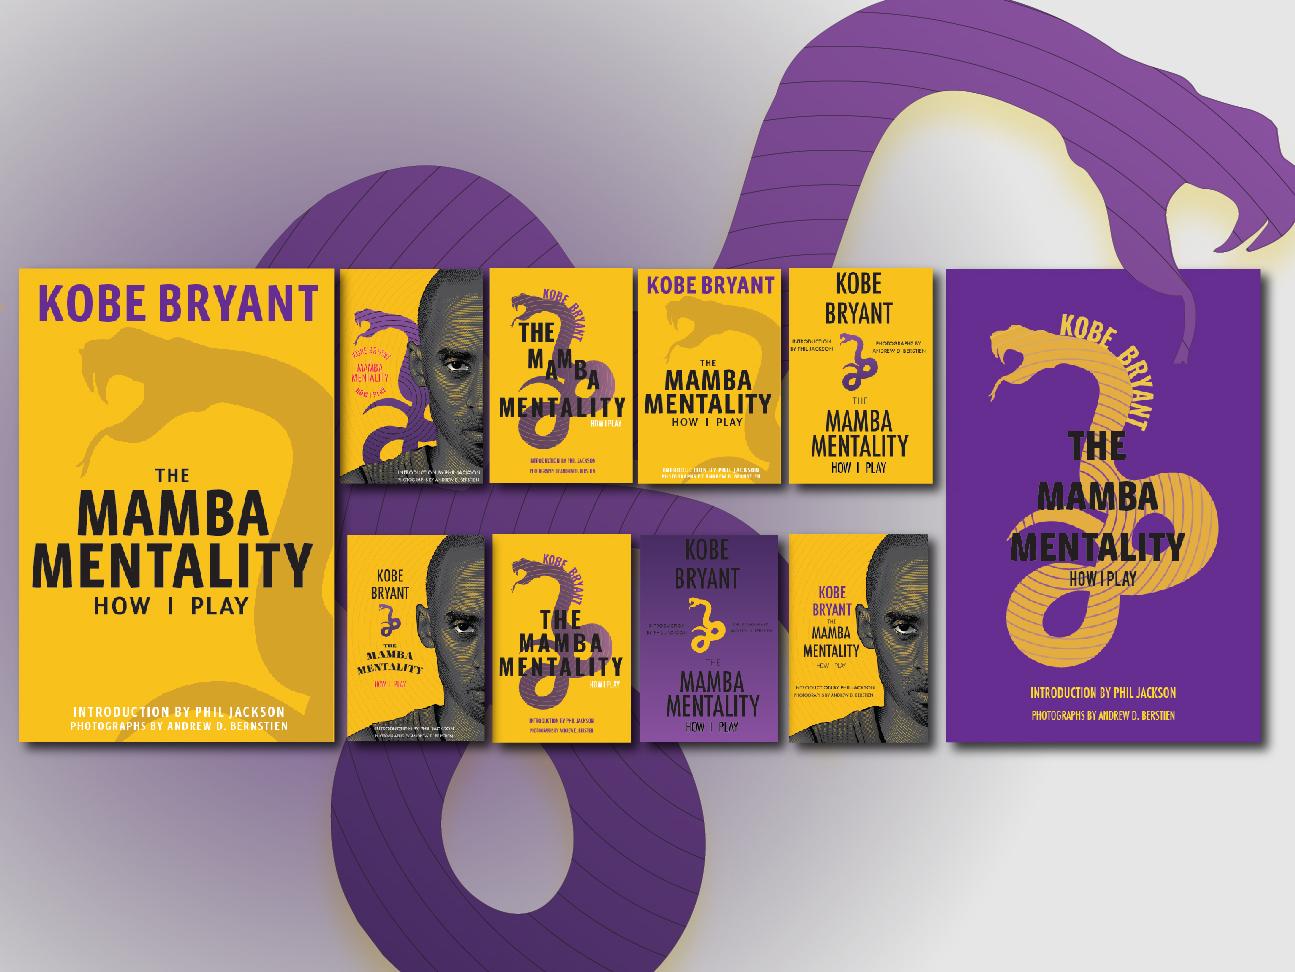 The Mamba Mentality Explorations kobe bryant illustration graphic design explorations book cover minimal lettering design challenge flat vector design